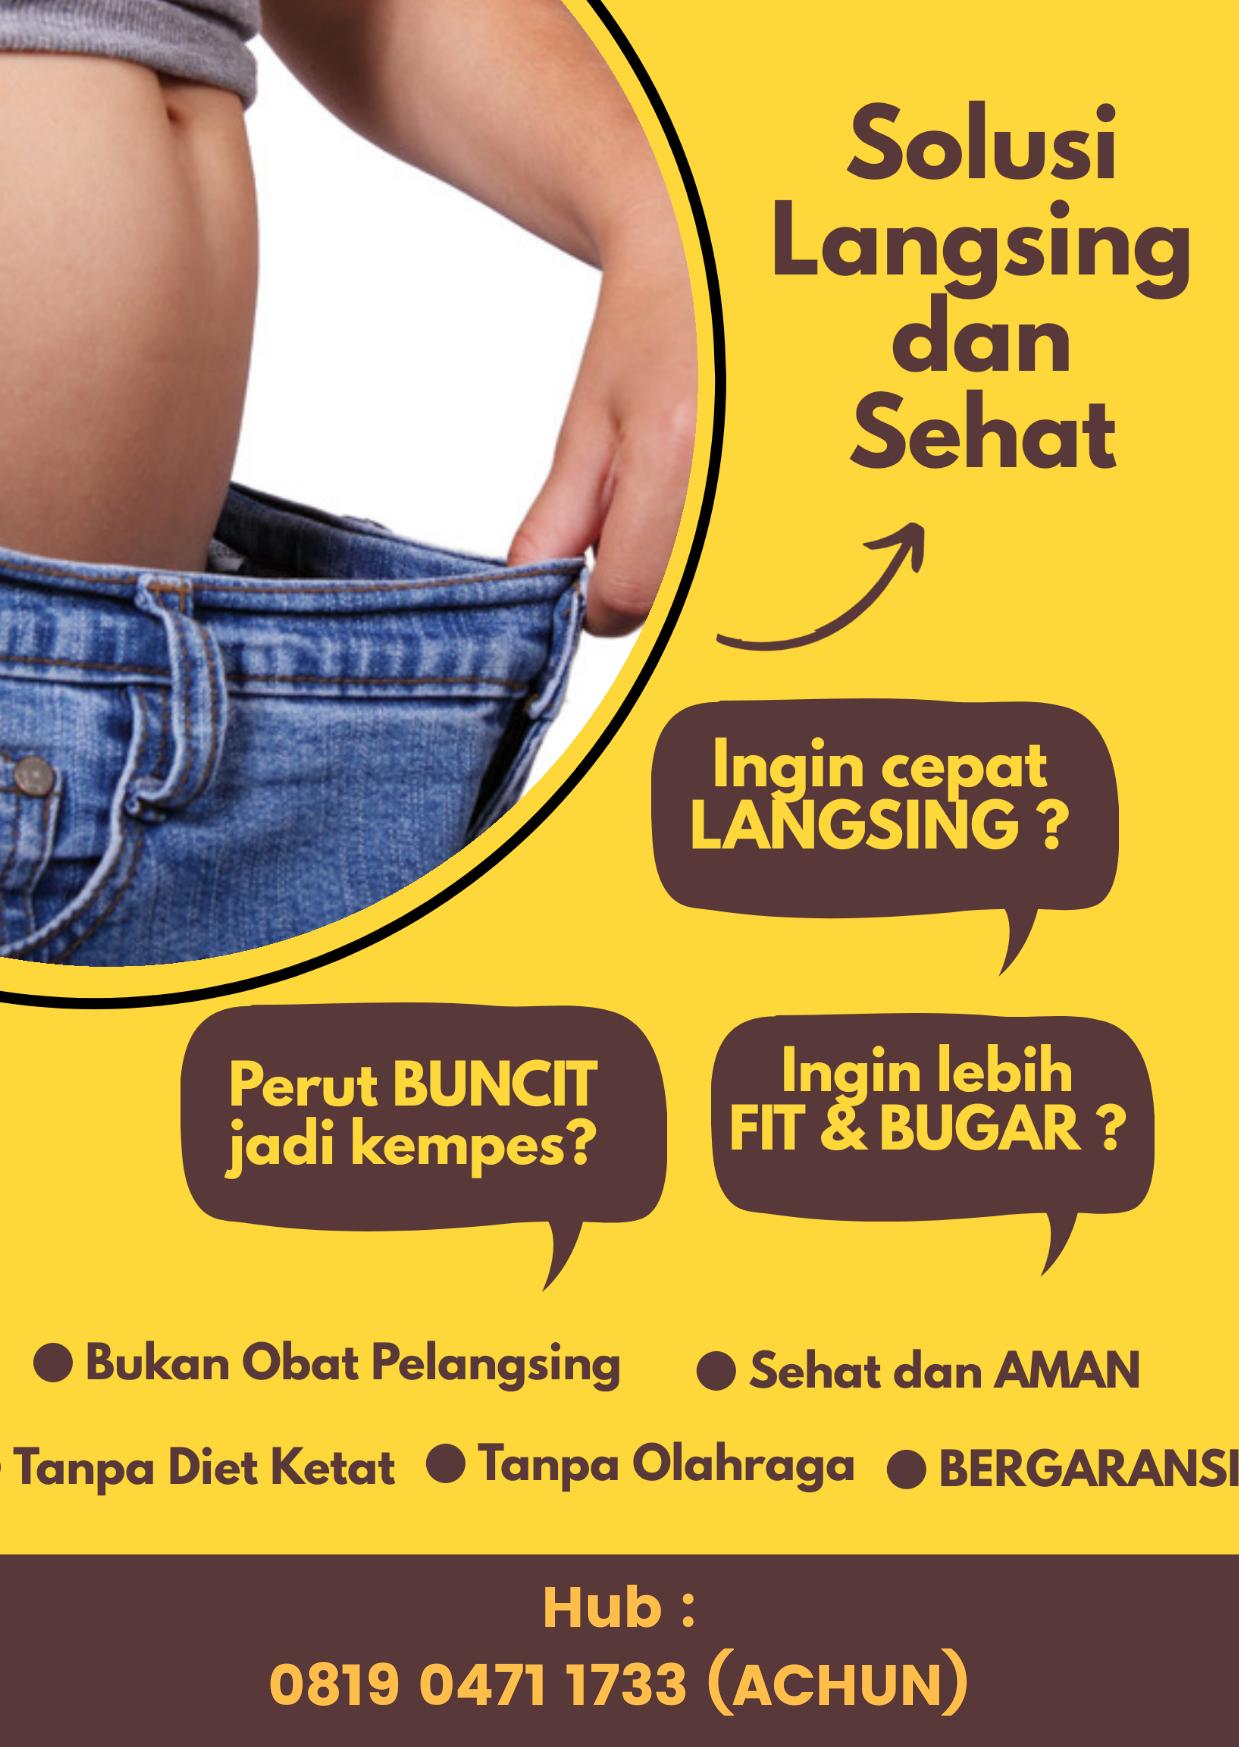 Diet Instan Tanpa Efek Samping Wa 0819 0471 1733 Diet Sehat Blitar V 2020 G